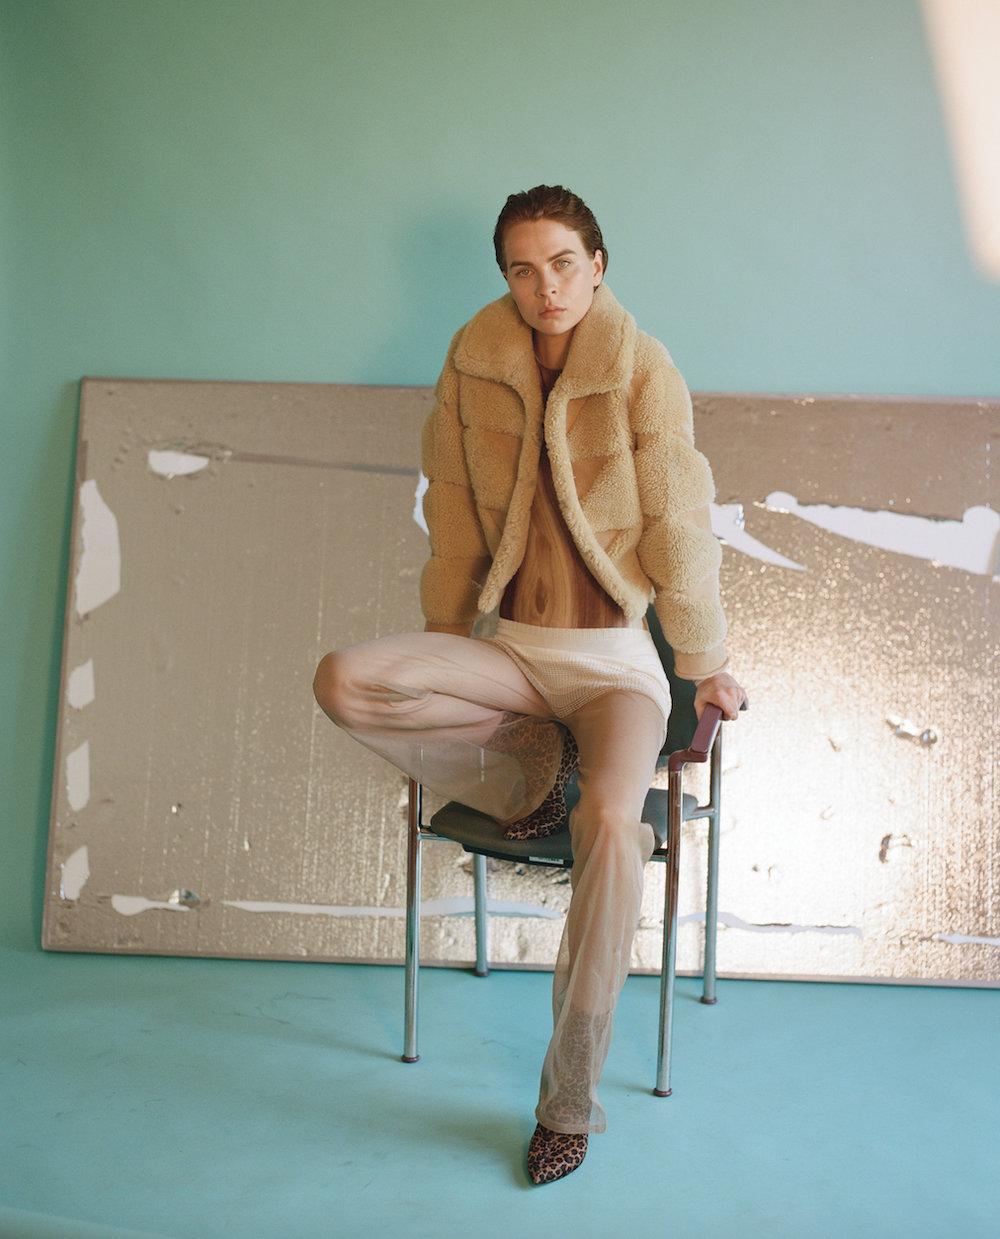 Chaqueta de  MAISON MARGIELA, mono de  ACNE STUDIOS, pantalones de  LEMAIRE  y botas de la estilista.